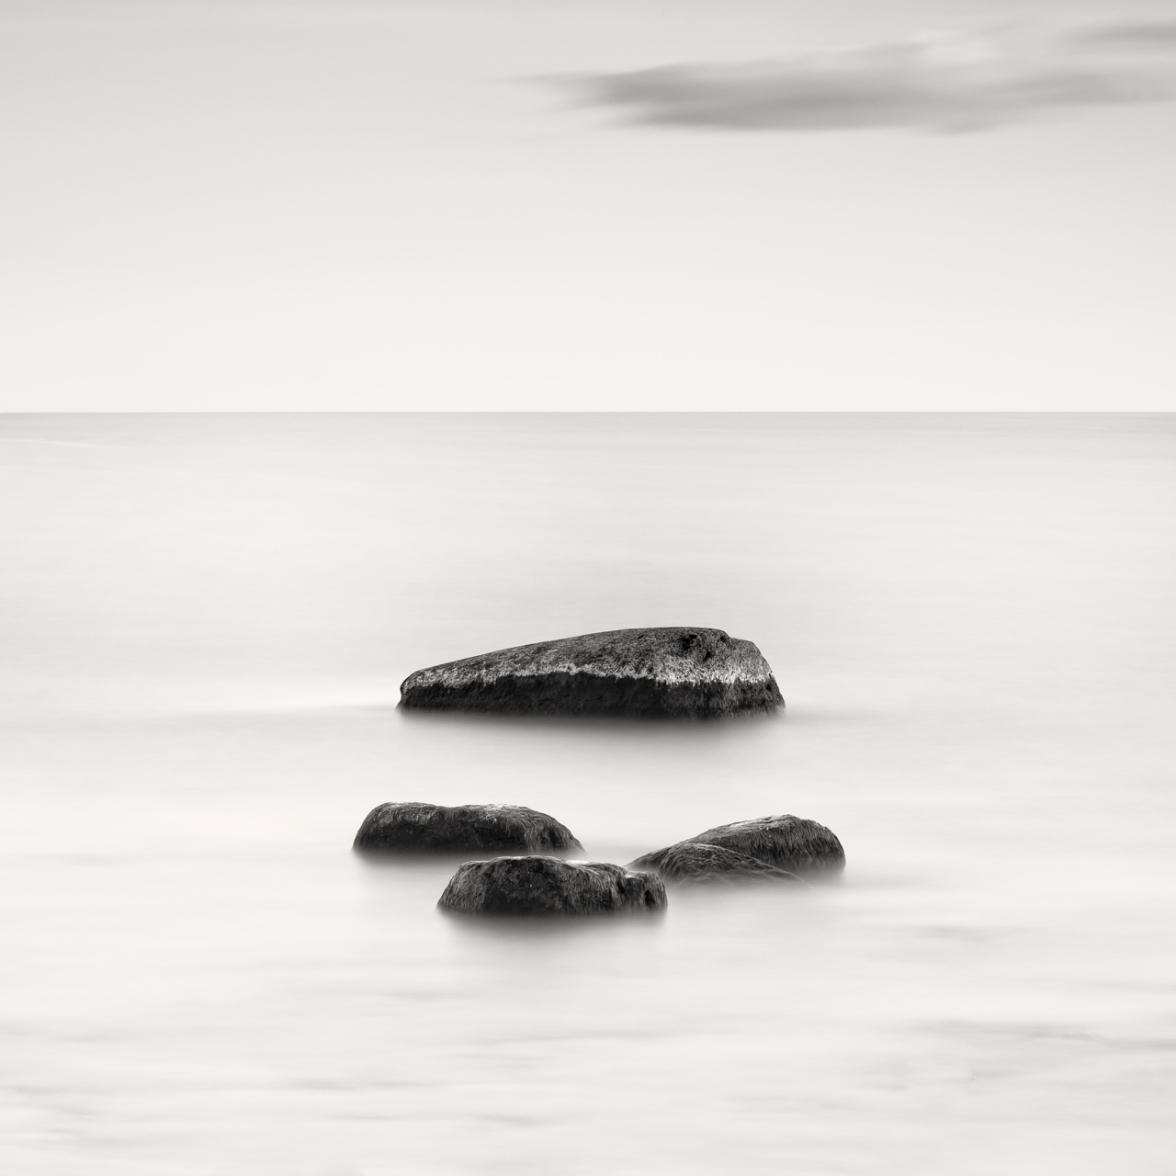 Boulders,2014,© Frang Dushaj